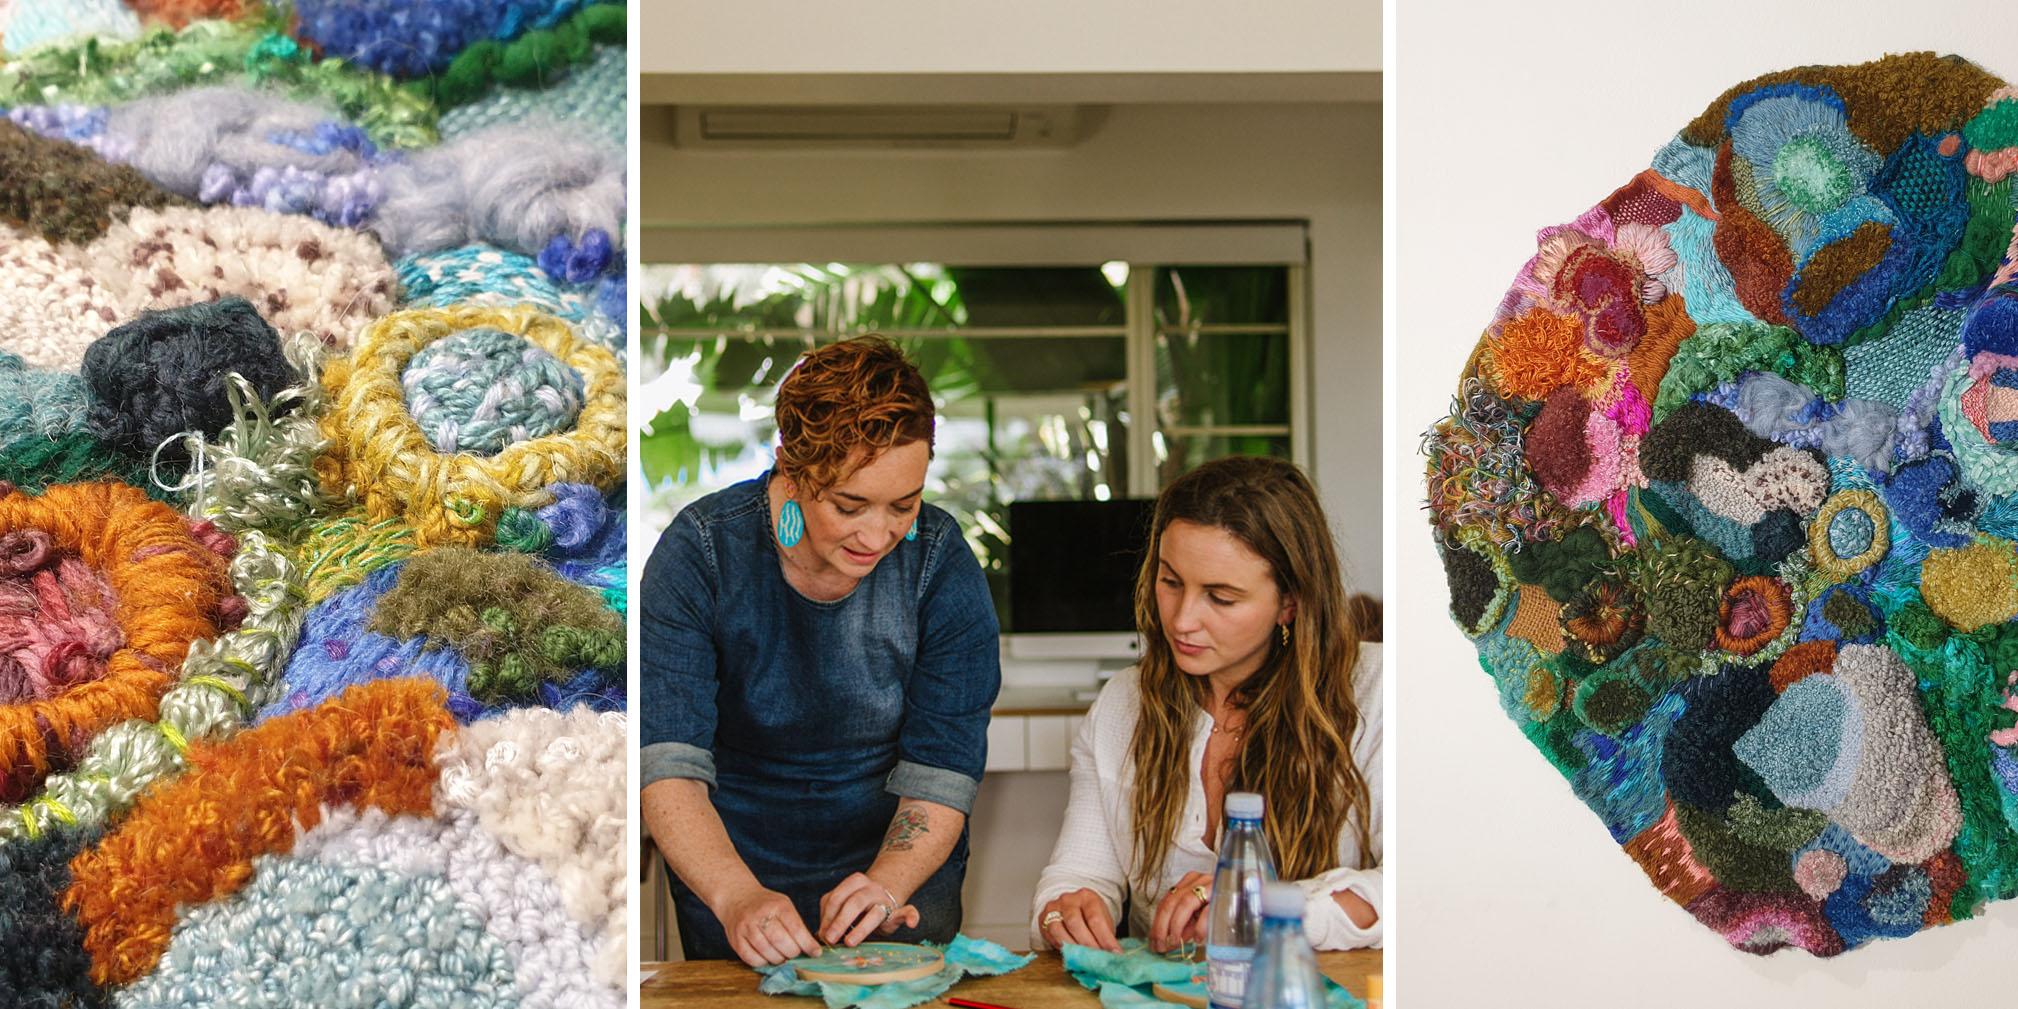 Rockpool Embroidery Workshop - October